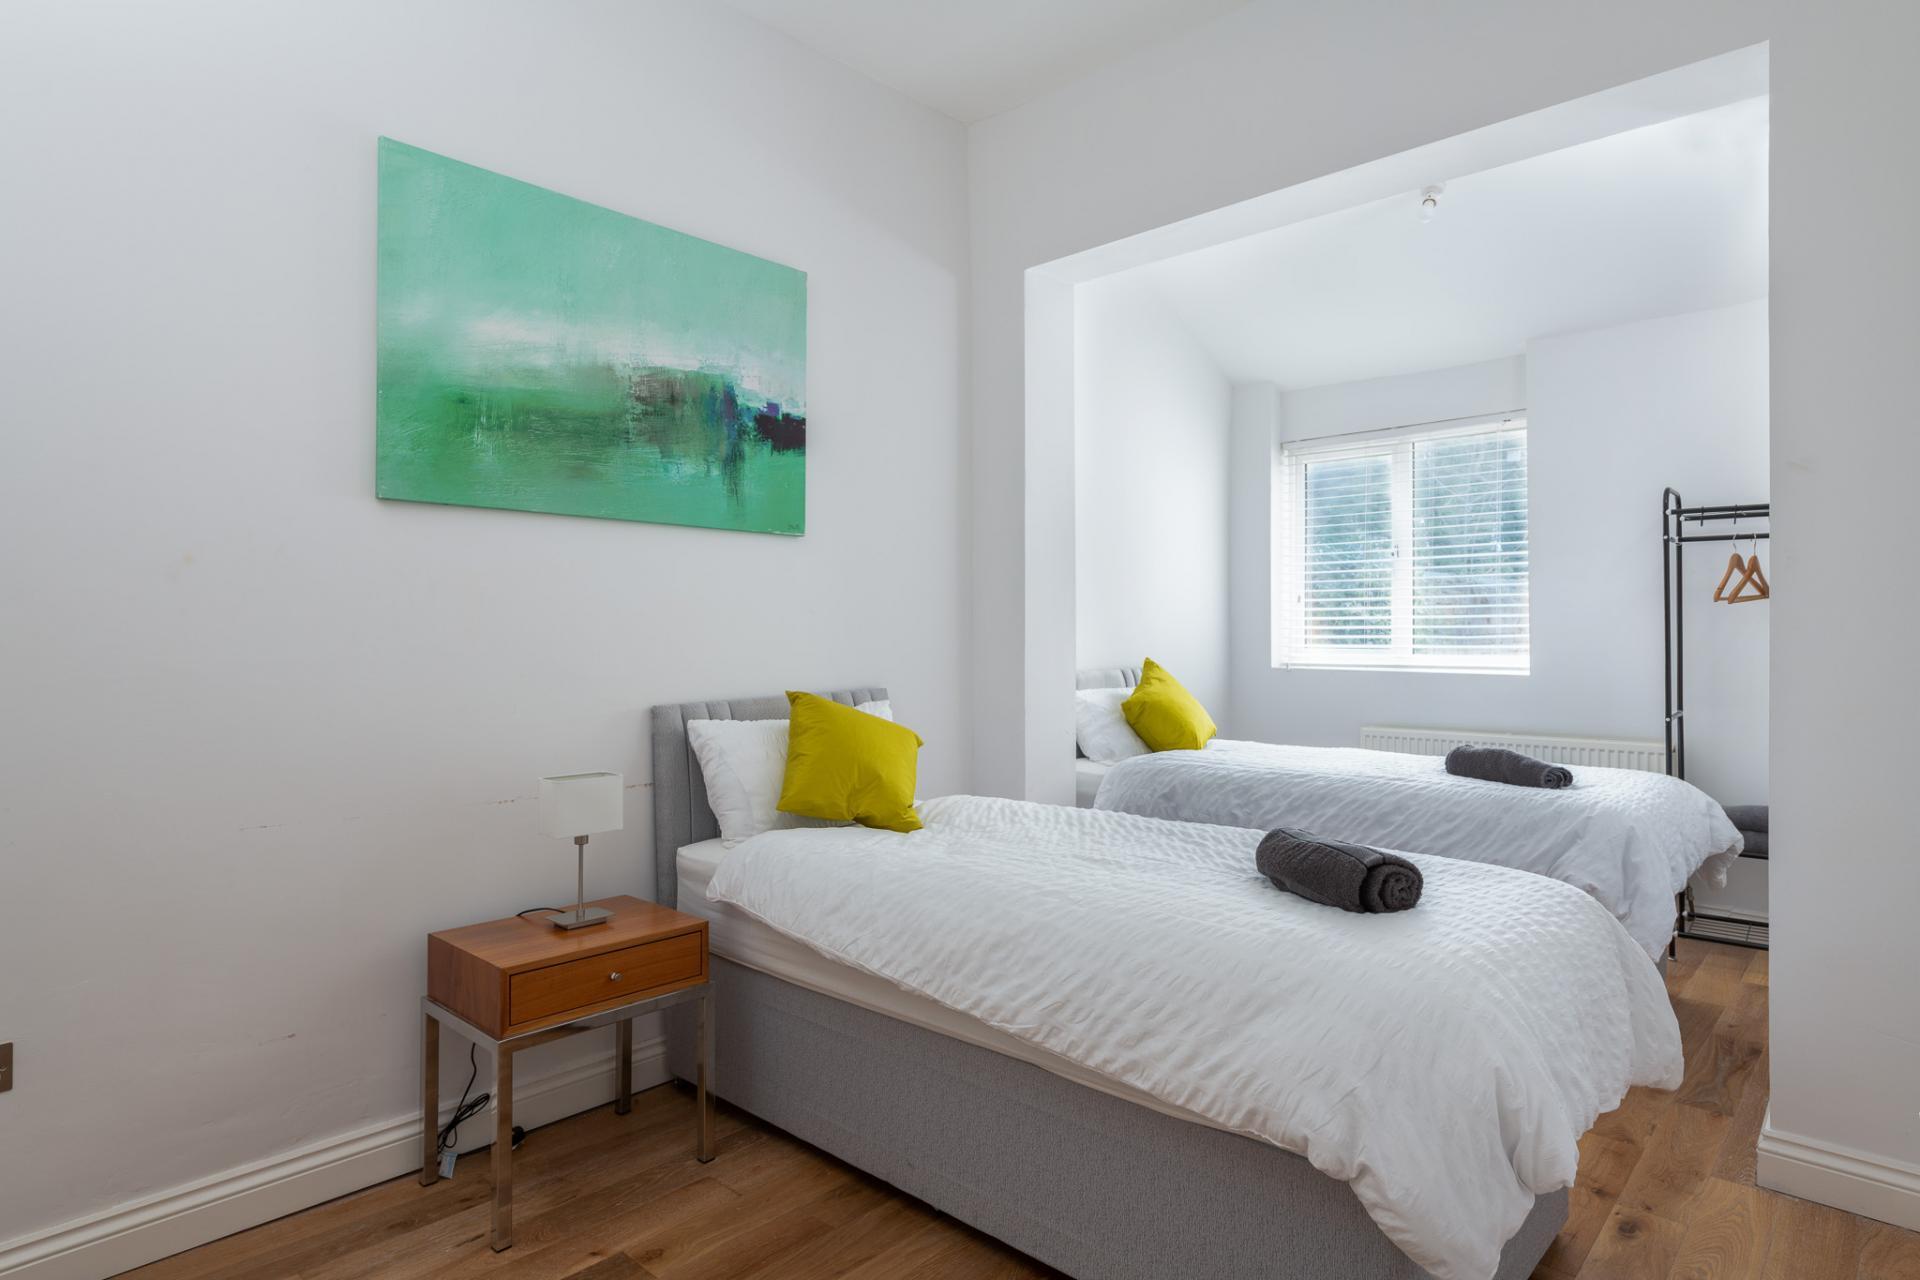 Twin beds at Edgbaston Apartments, Rotton Park, Birmingham - Citybase Apartments